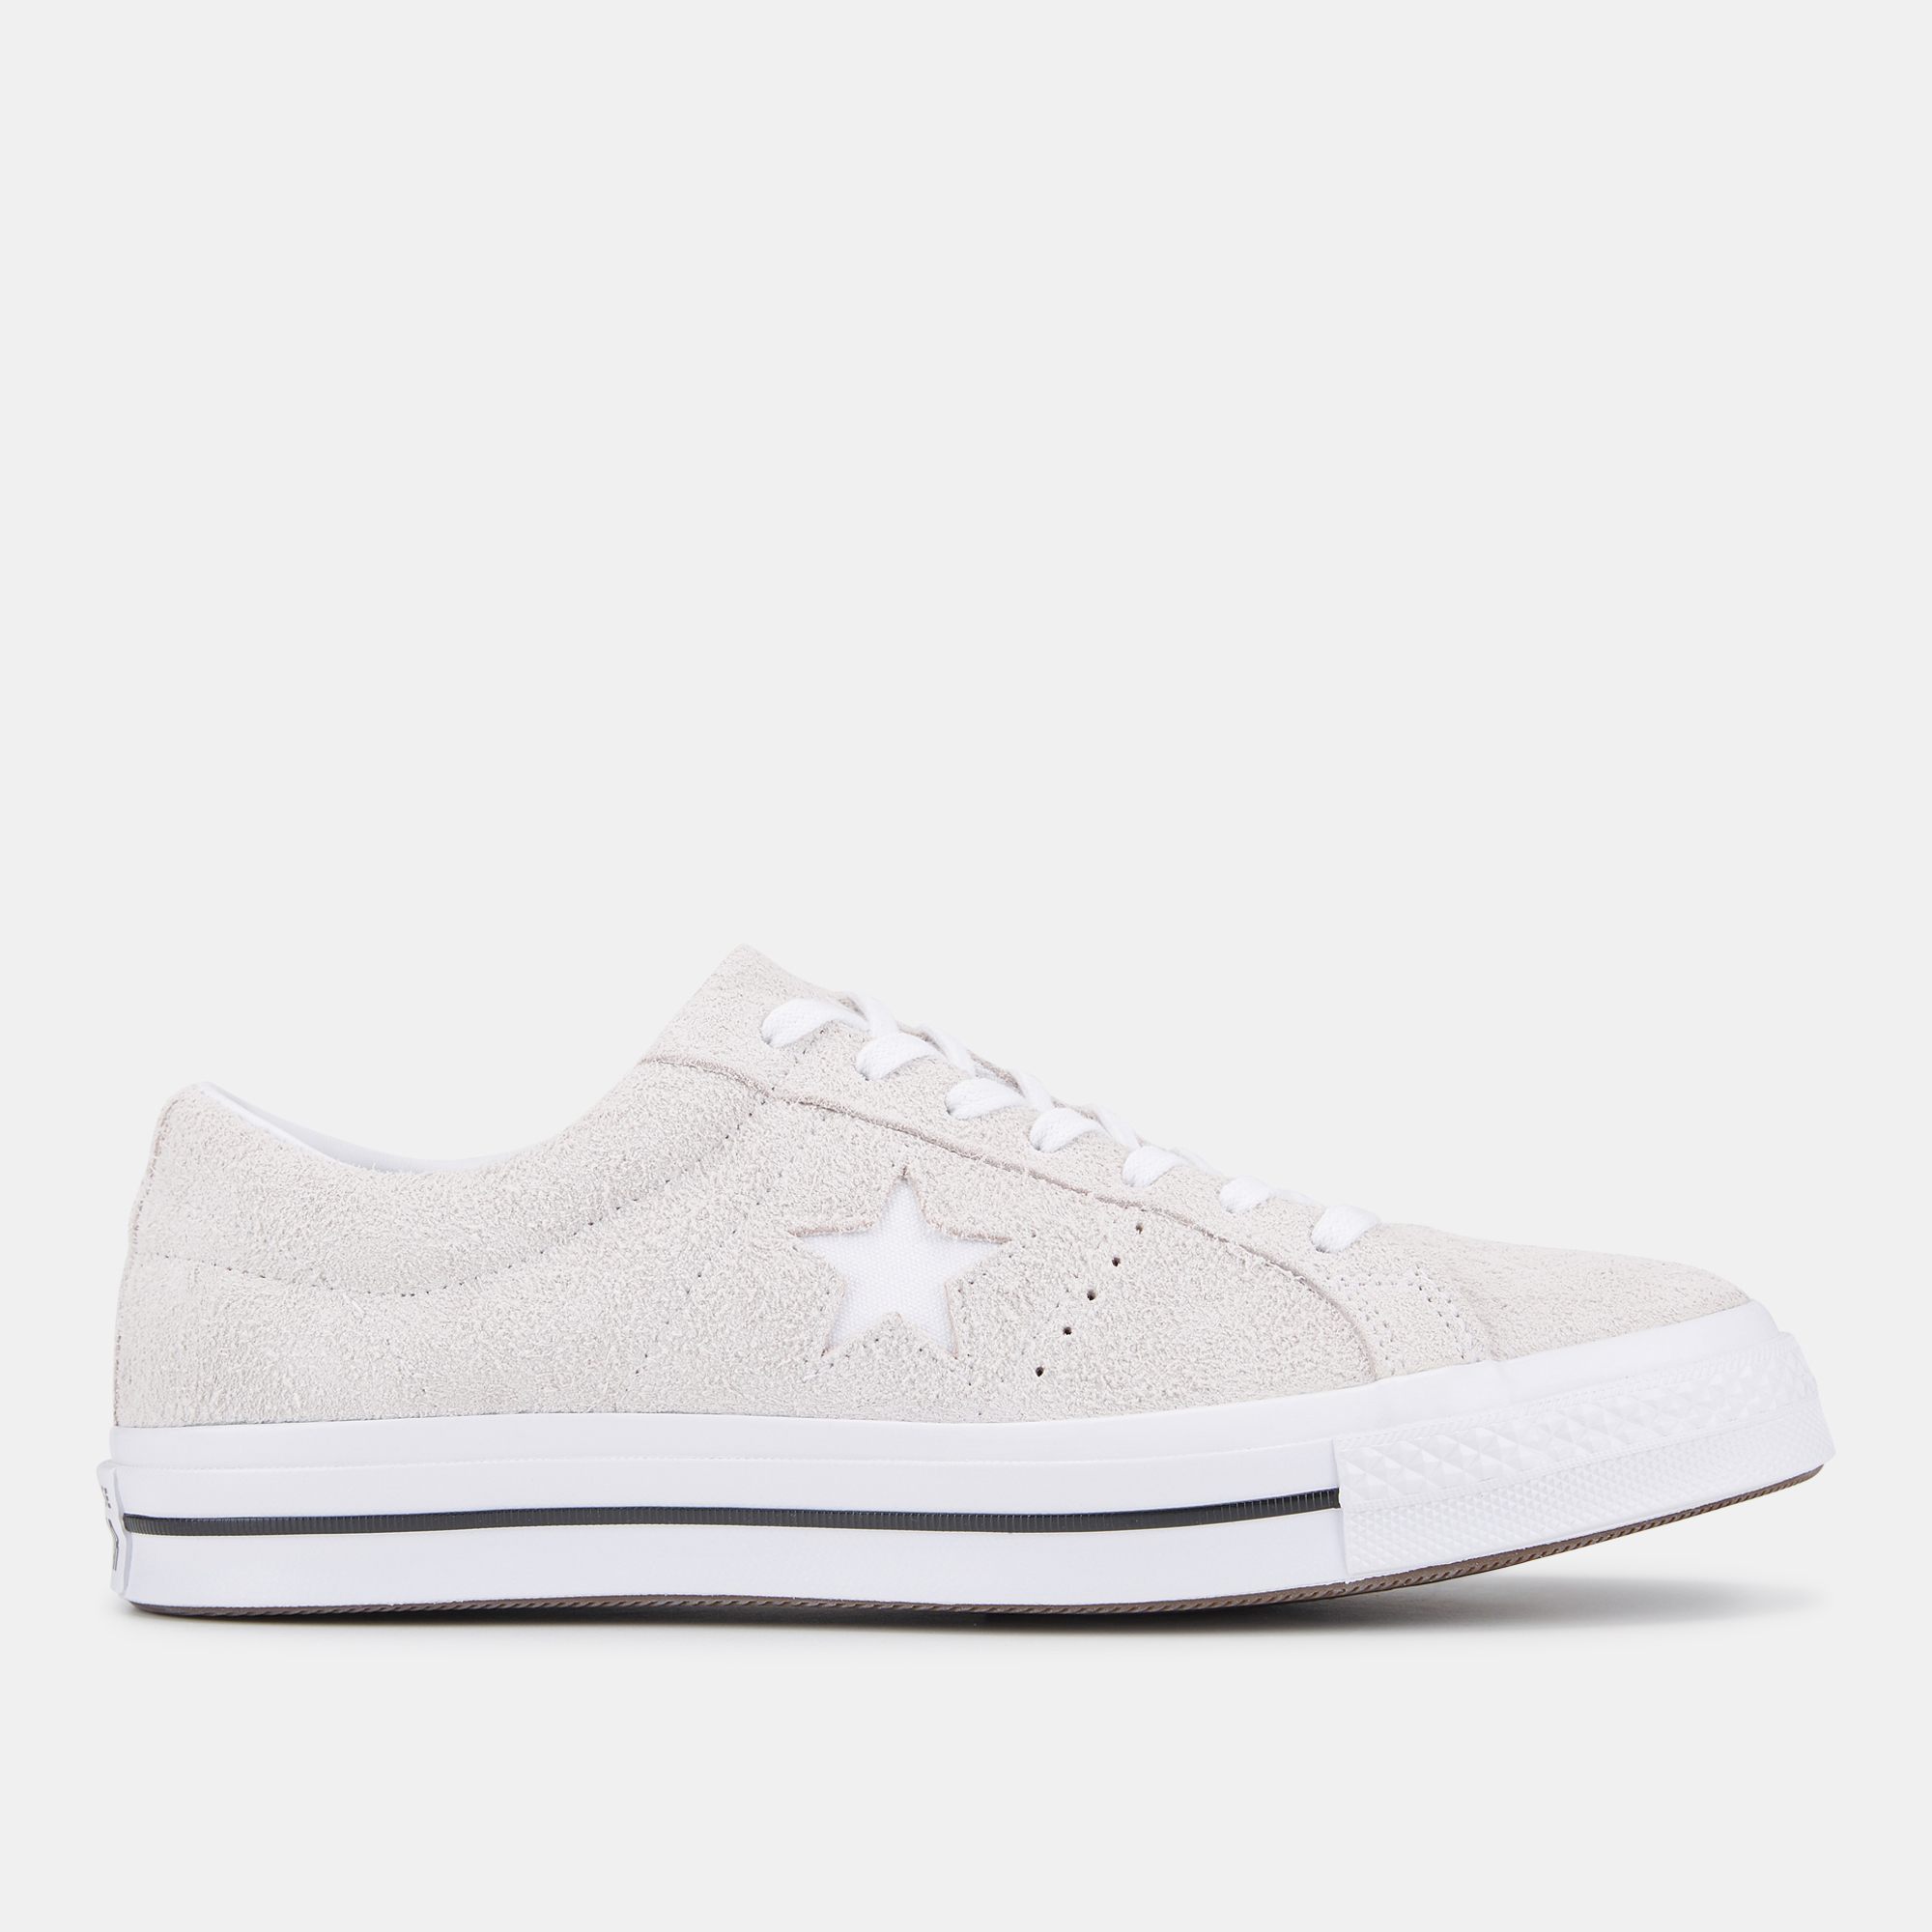 official photos af3ec cbdf6 Converse One Star Vintage Suede Low Top Shoe | Sneakers | Shoes ...